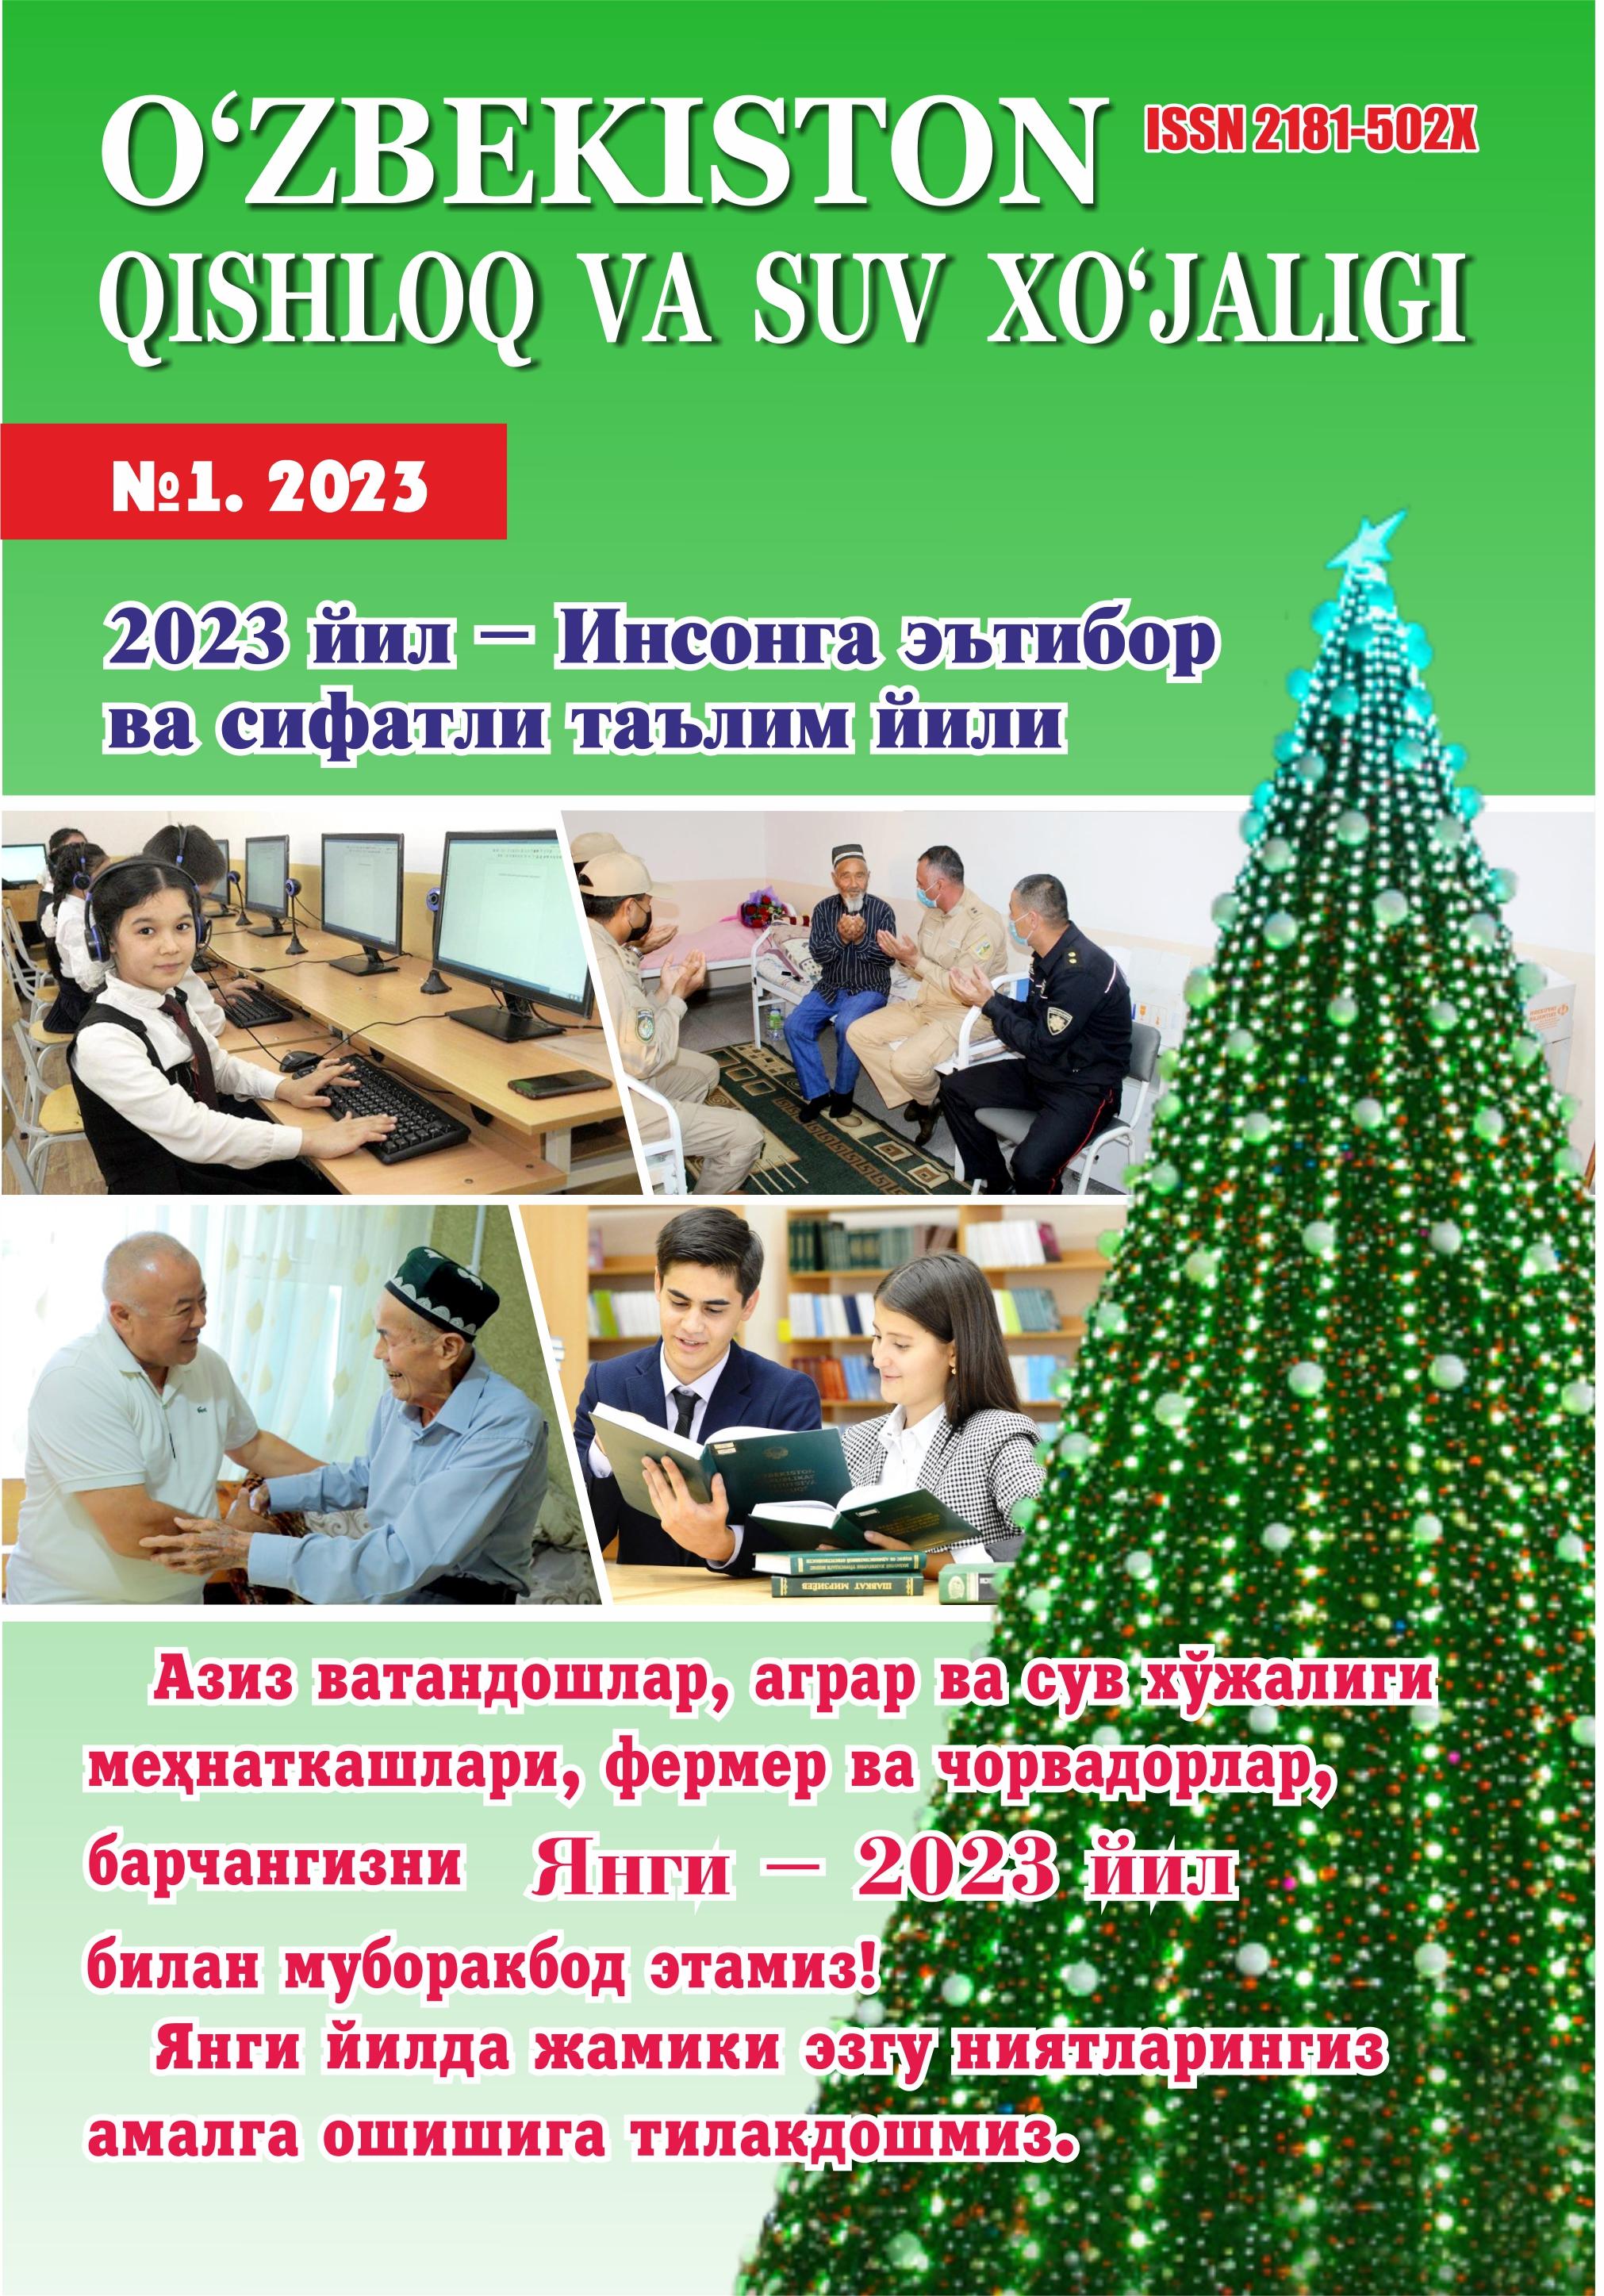 «O'zbekiston qishloq va suv xo'jaligi» журнали 1 сонини ...